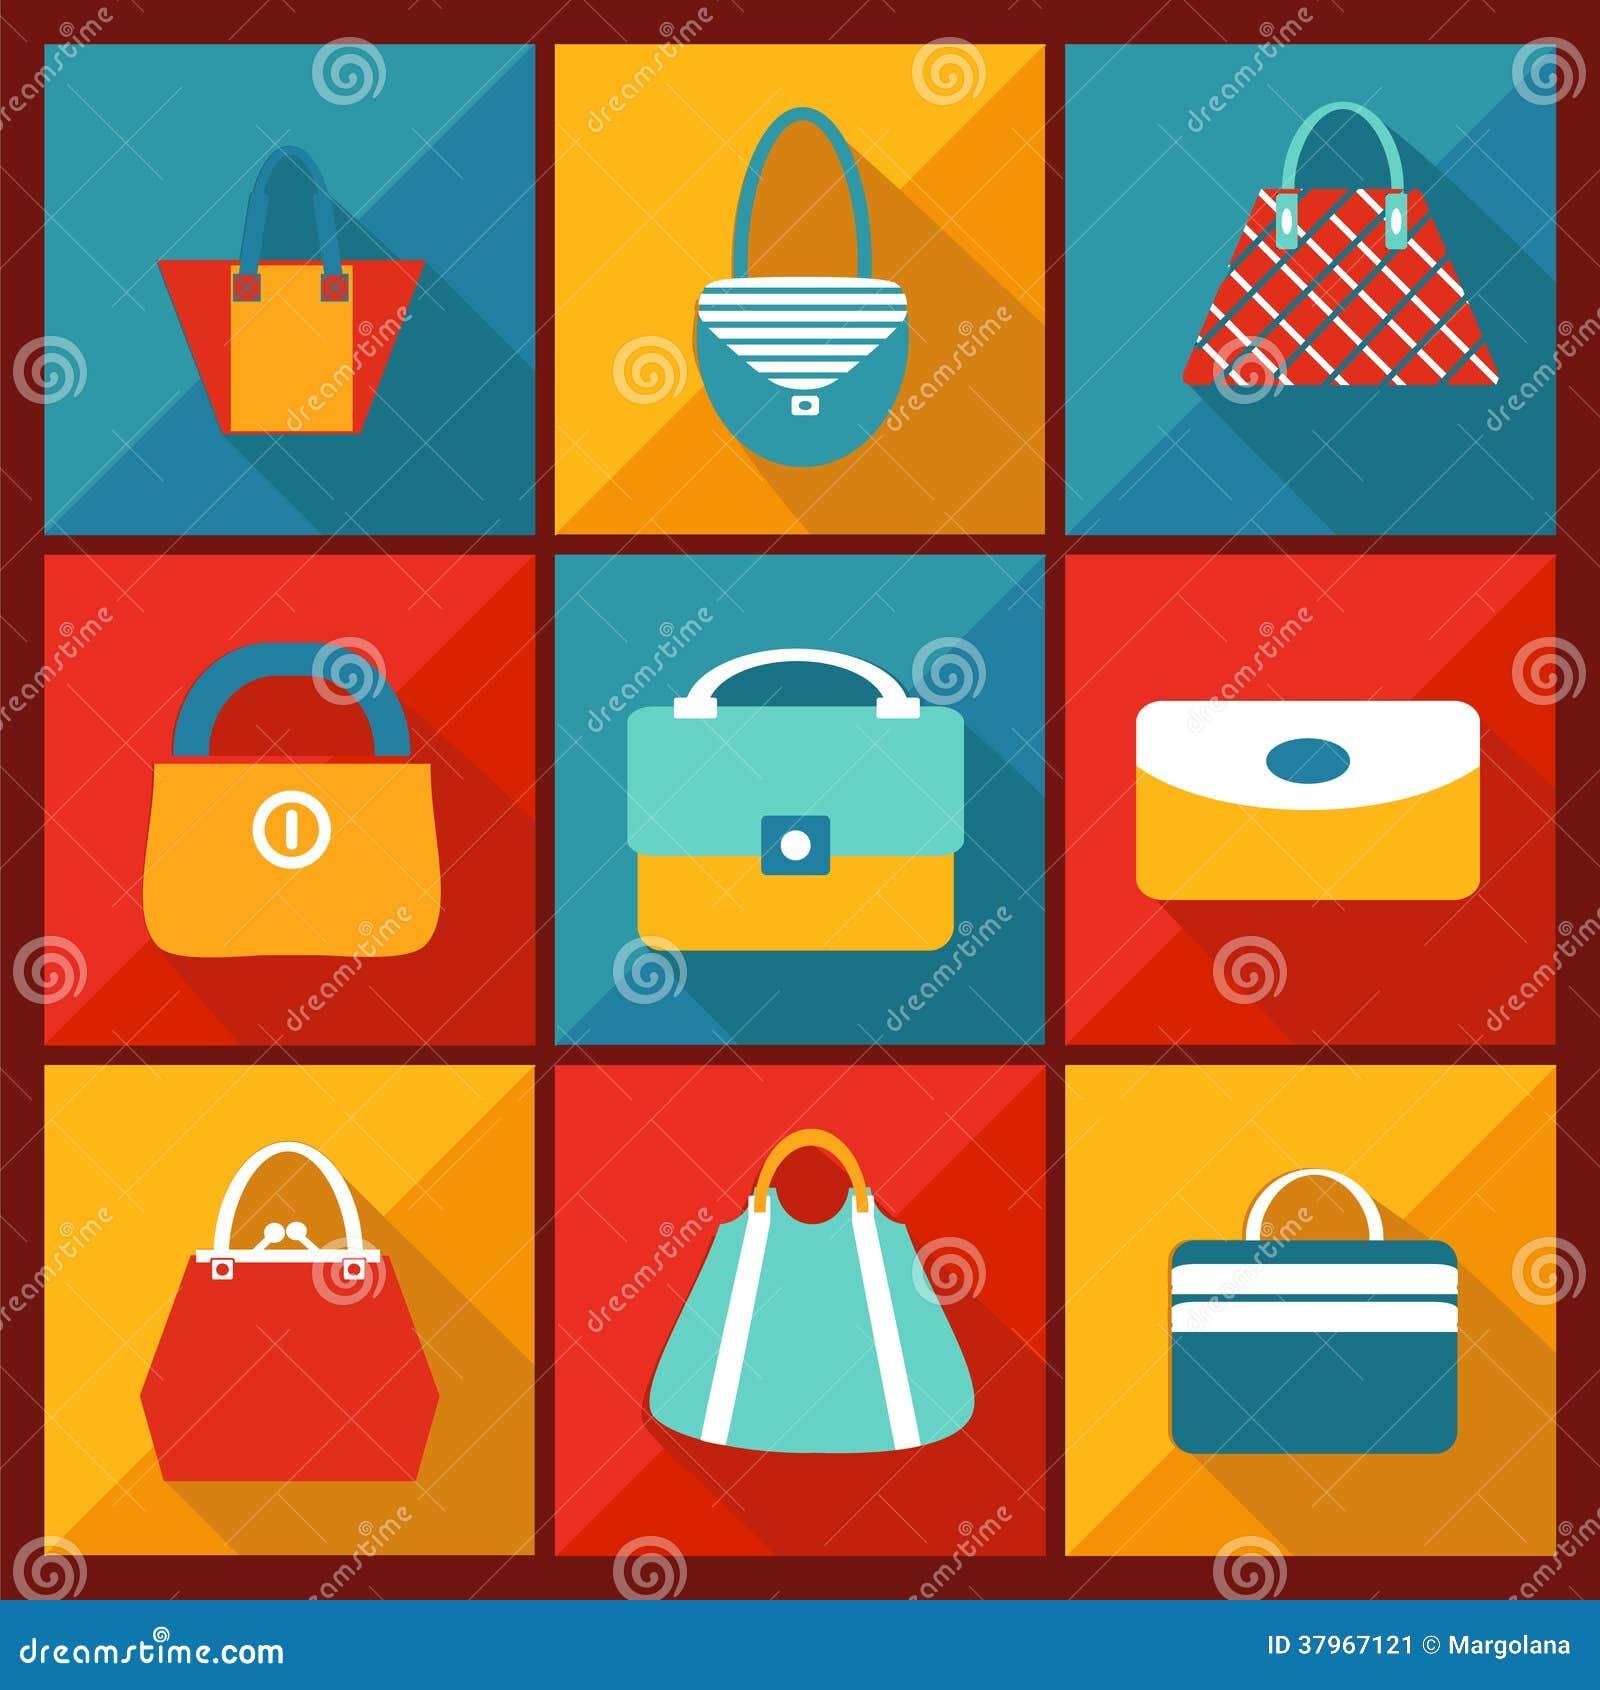 Color Flat Icon Of Fashion Bag Stock Image Image 37967121